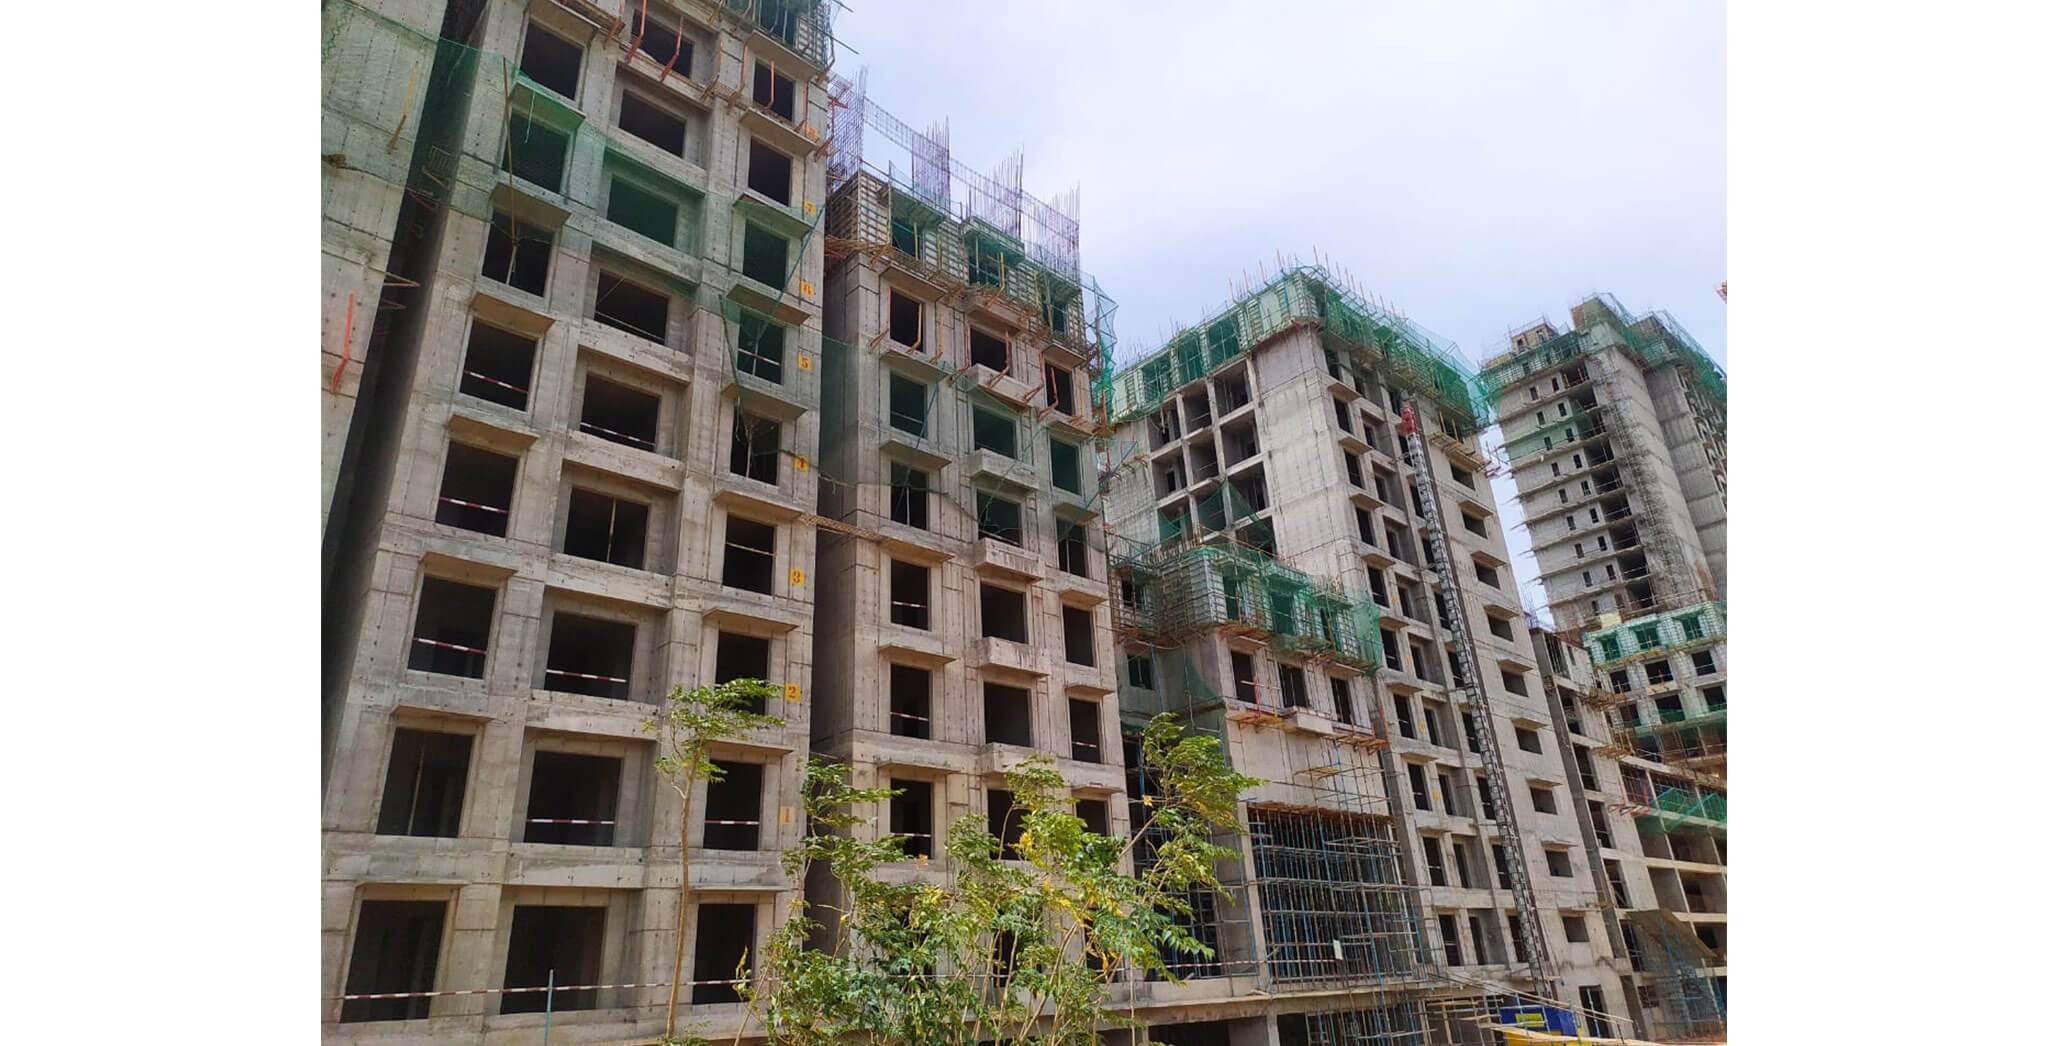 Jun 2021 - Helio: Wing B—On commencement of tenth floor slab